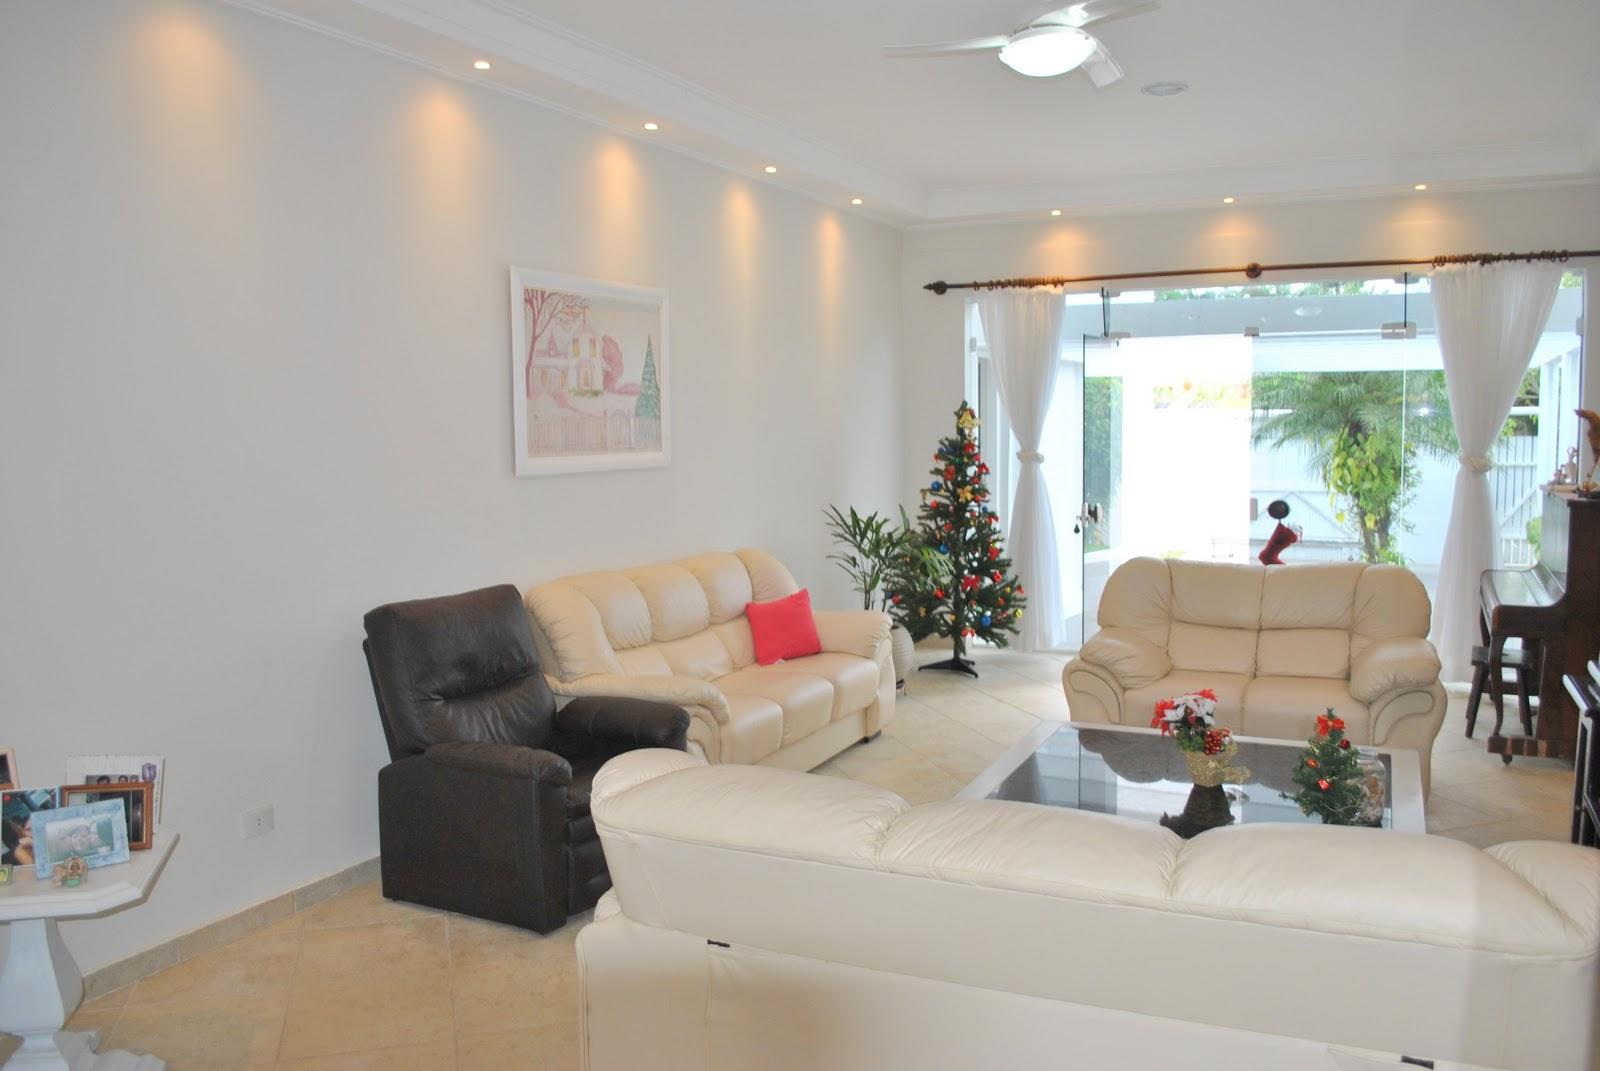 Pruzak Com Sala Quadrada Pequena Dois Ambientes Id Ias  -> Sala De Estar Pequena Dois Ambientes